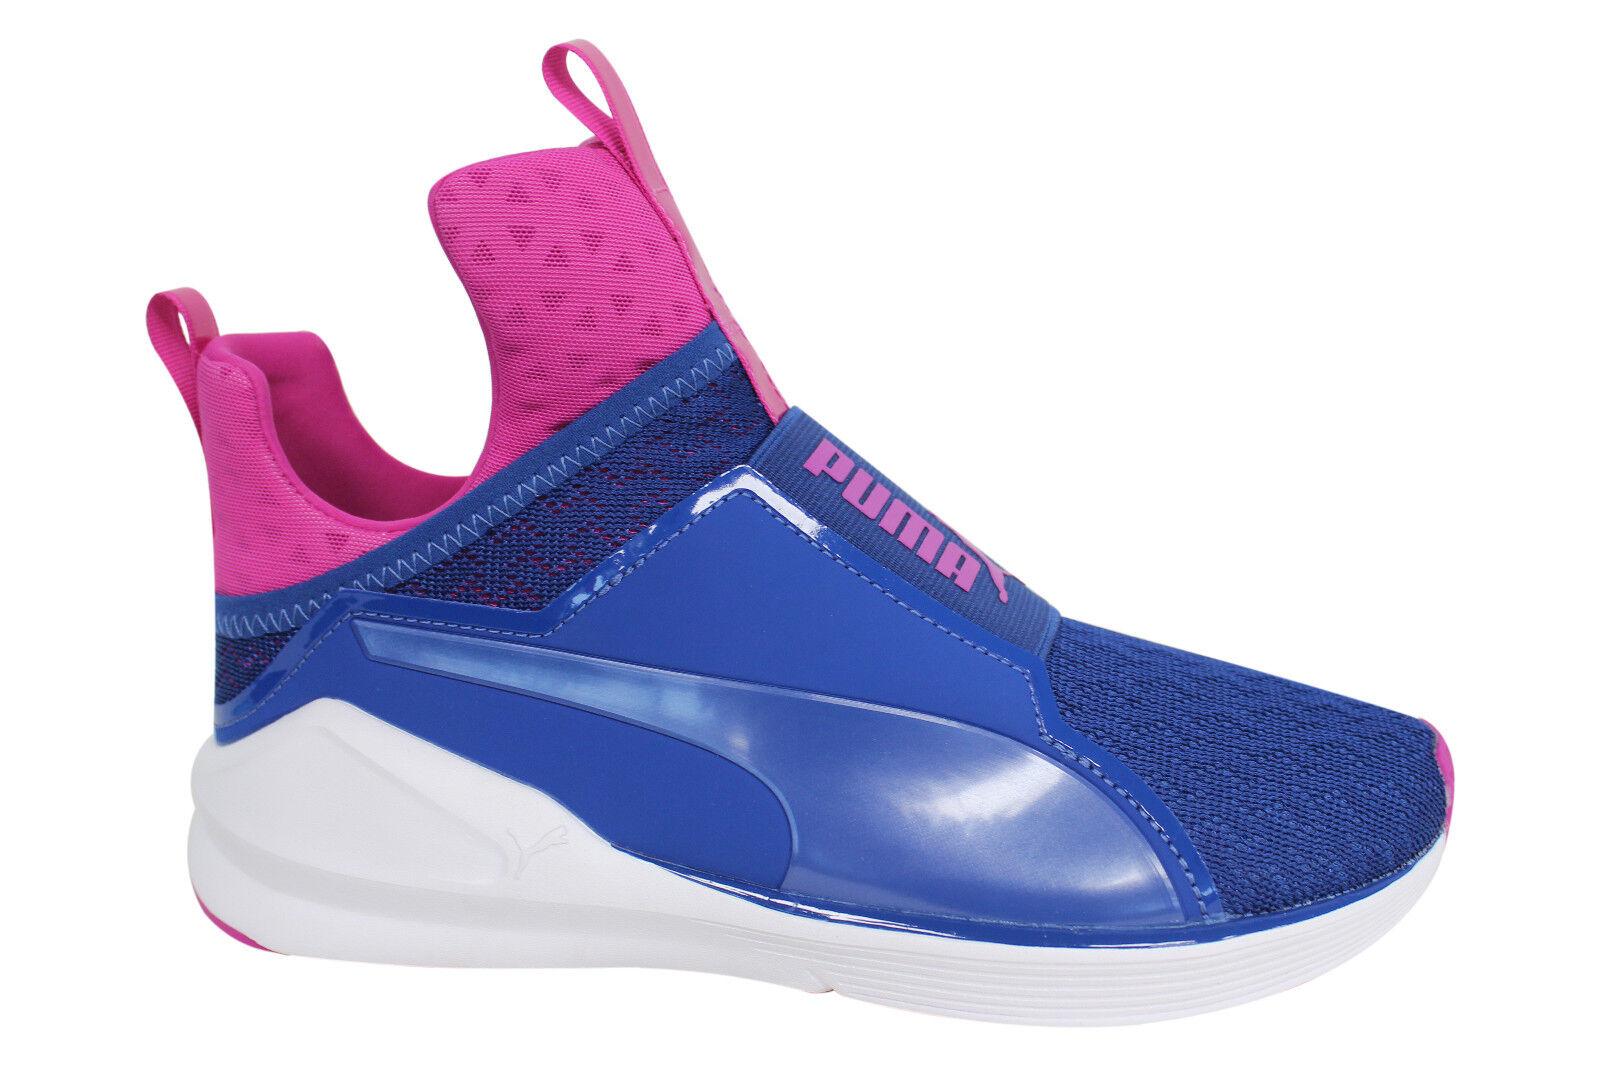 Puma Fierce Dance Training Trainers Damenschuhe Slip On Blau Trainers Training 189417 06 P0 410f40